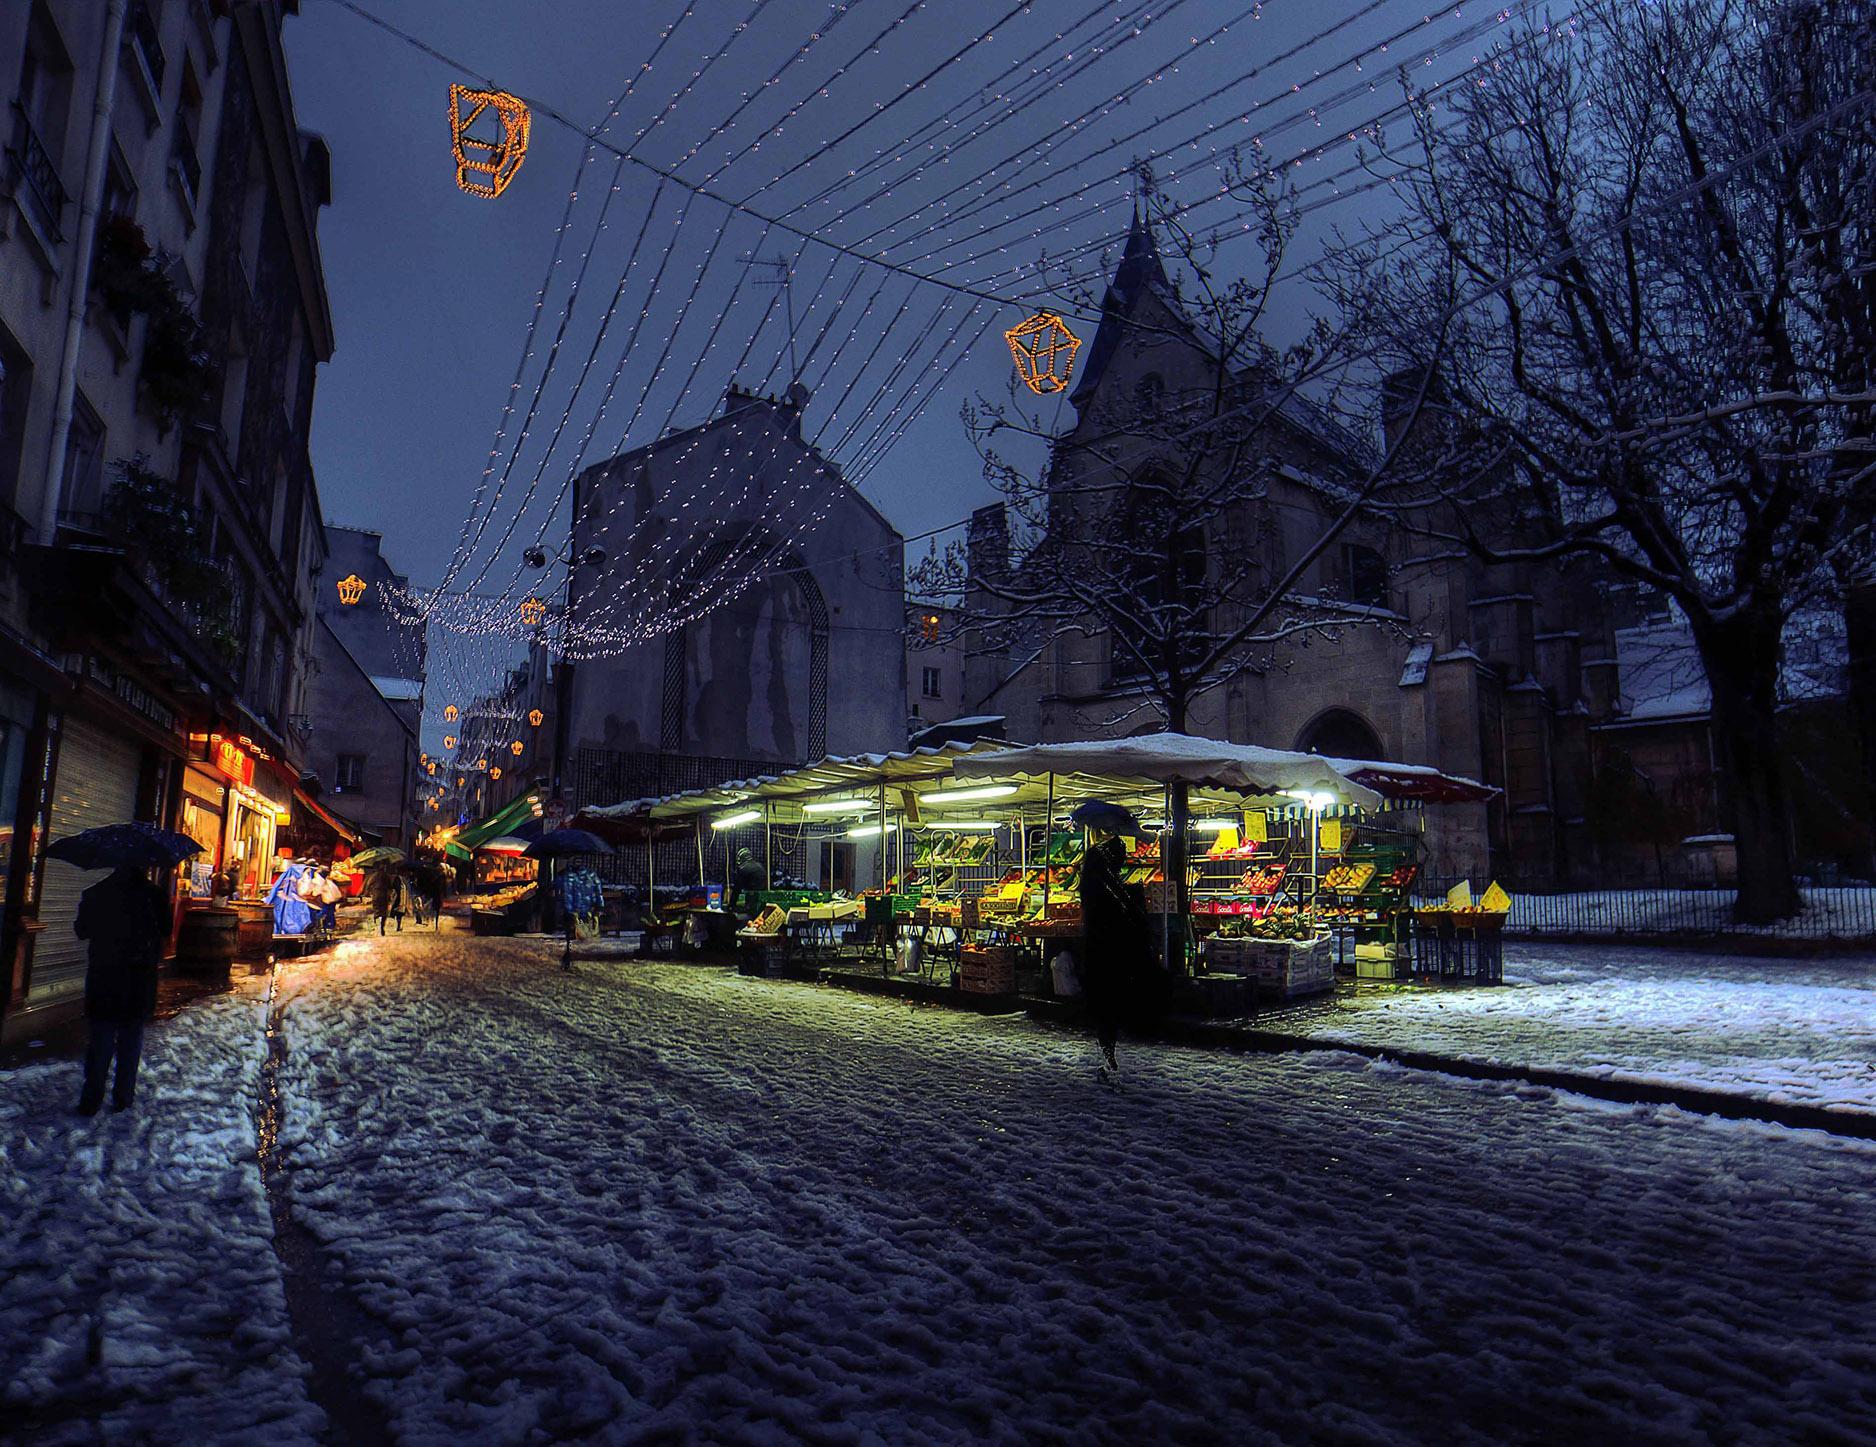 rue Mouffetard 1